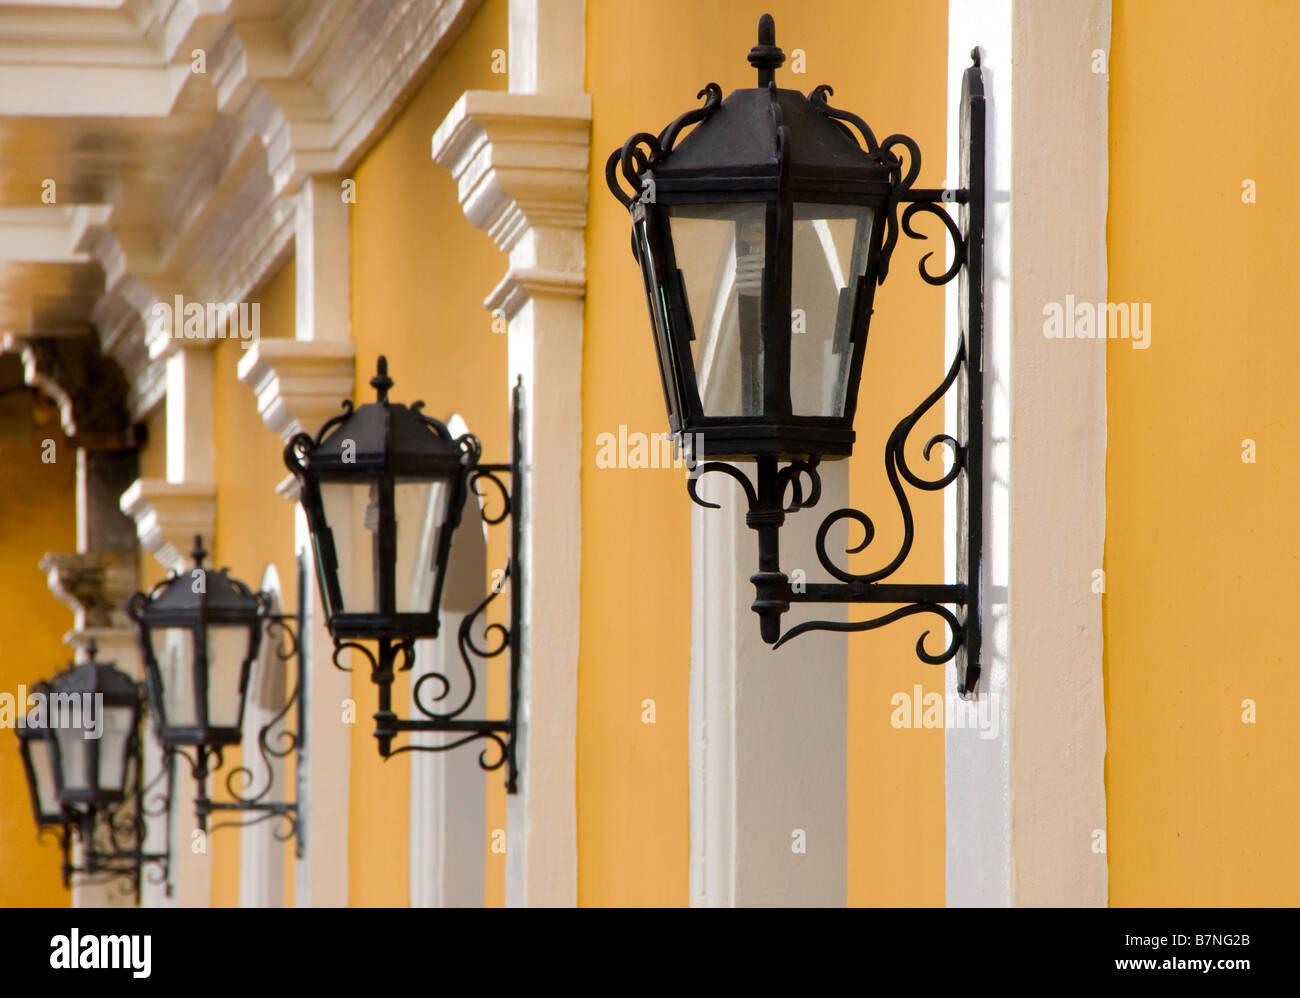 Granada Kolonialarchitektur, Hotel La Gran Francia Wrougtht Eisen Lampen Stockbild